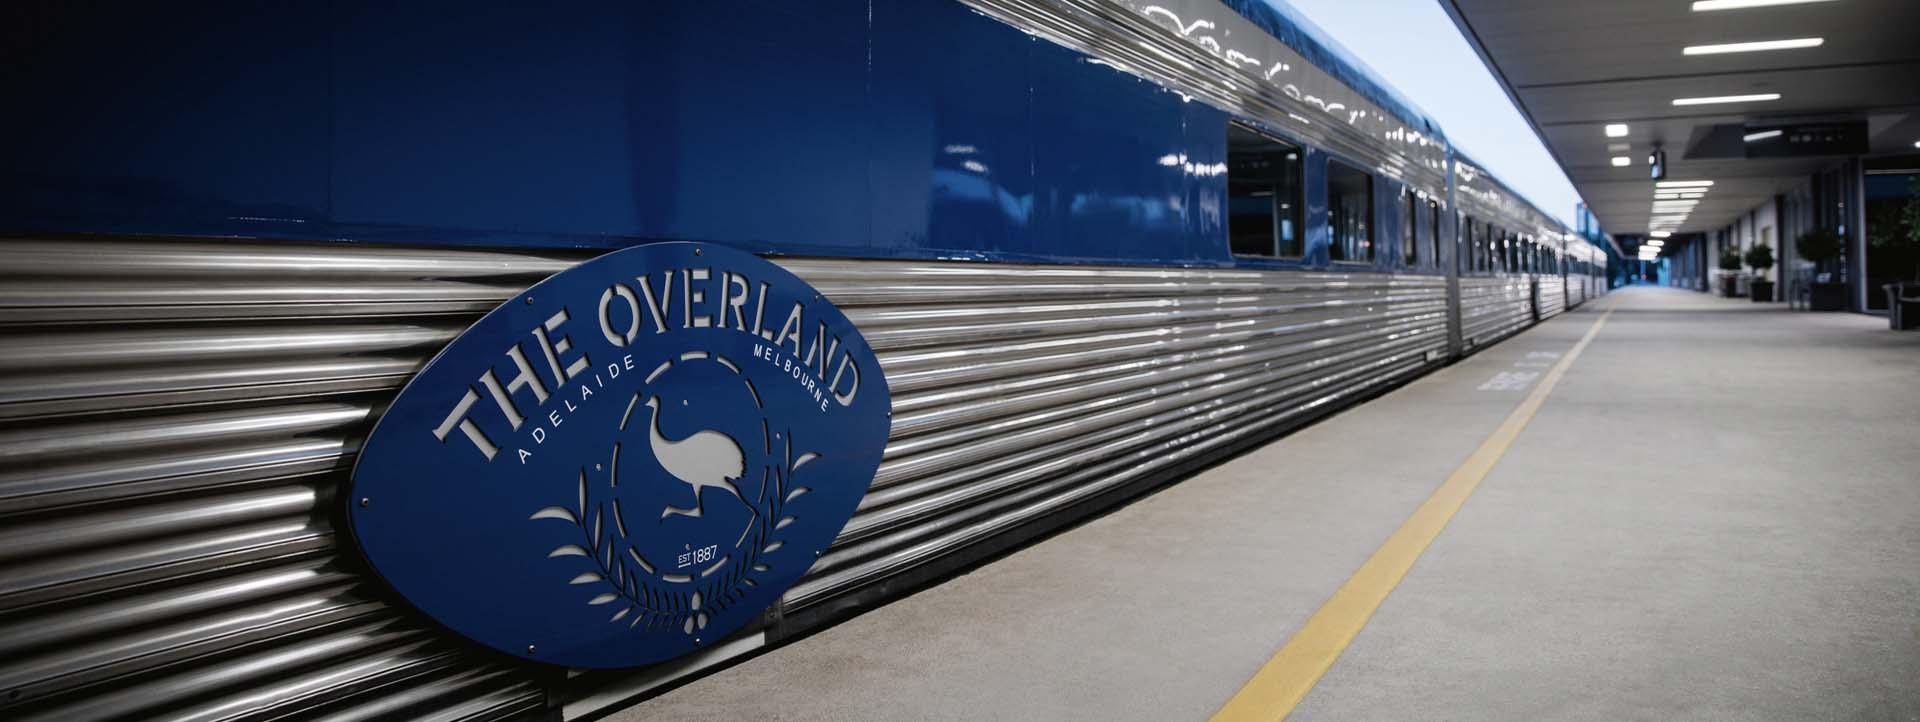 OVERLAND rail journeys Melbourne to Adelaide